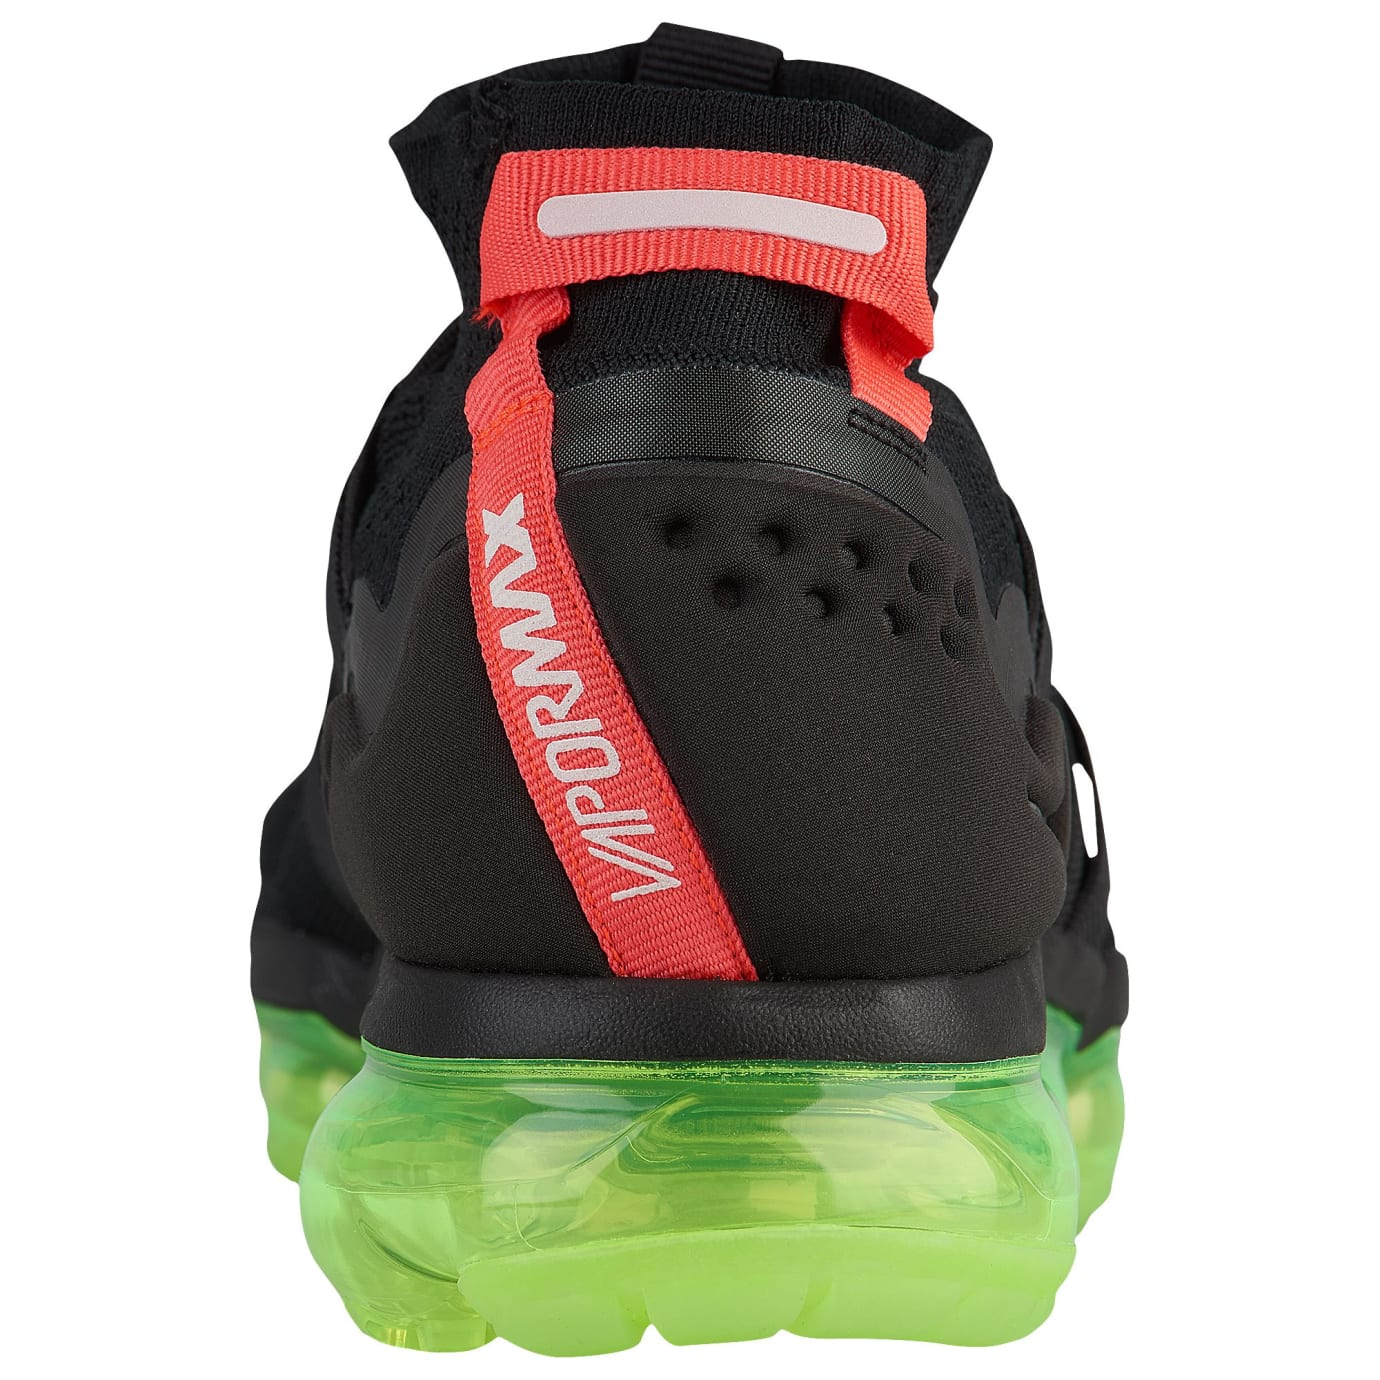 best cheap bb7e8 7820c Image via Foot Locker Nike Air VaporMax Flyknit Utility Yeezy Black Volt  Crimson Release Date AH6834-007 Heel